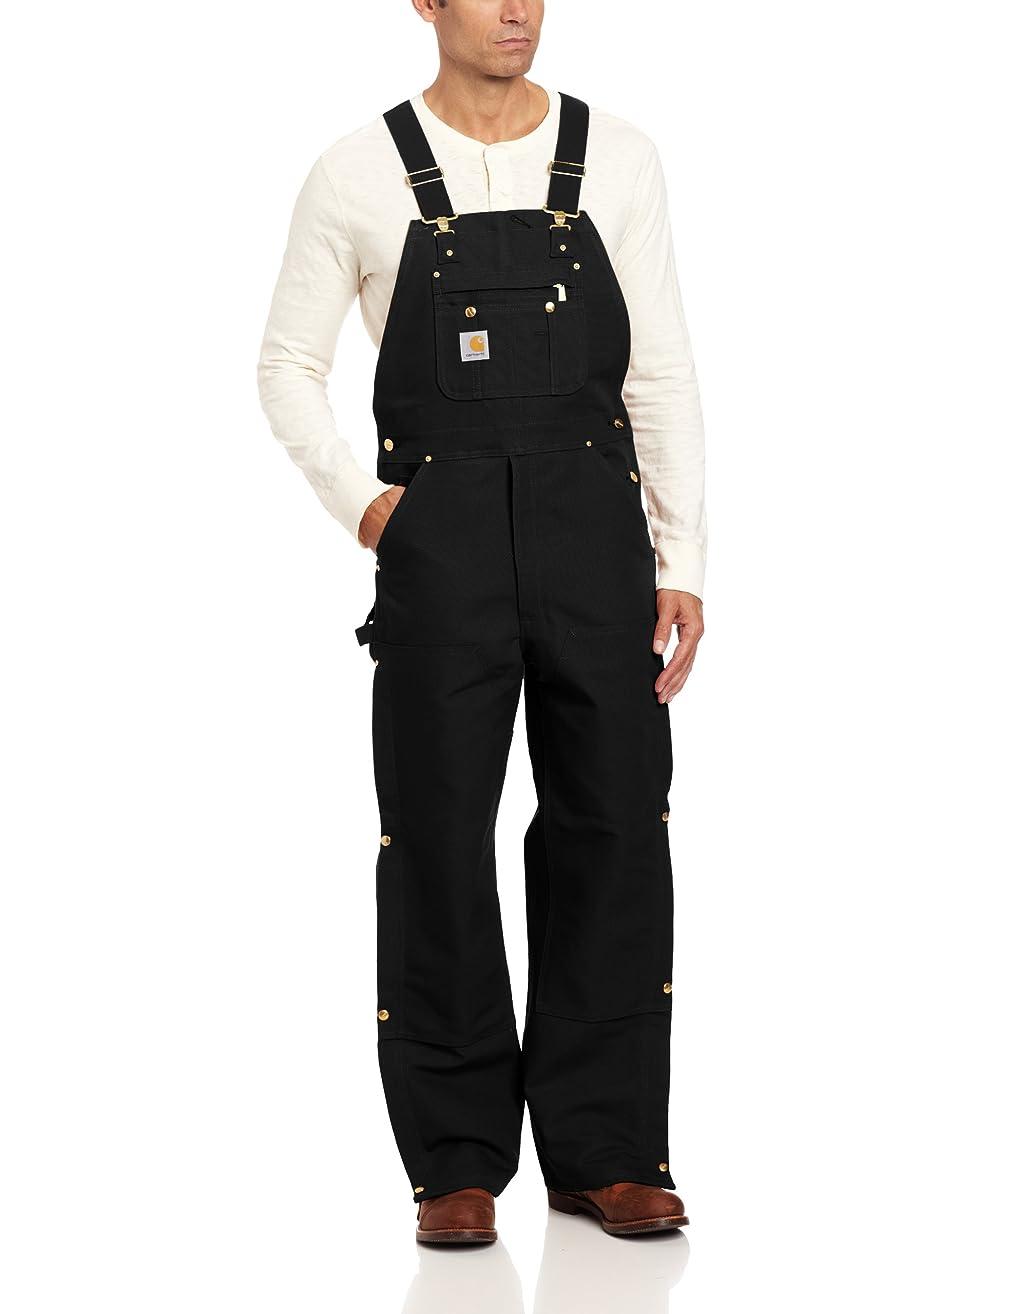 Carhartt Men's Zip To Thigh Bib Overall Unlined R37